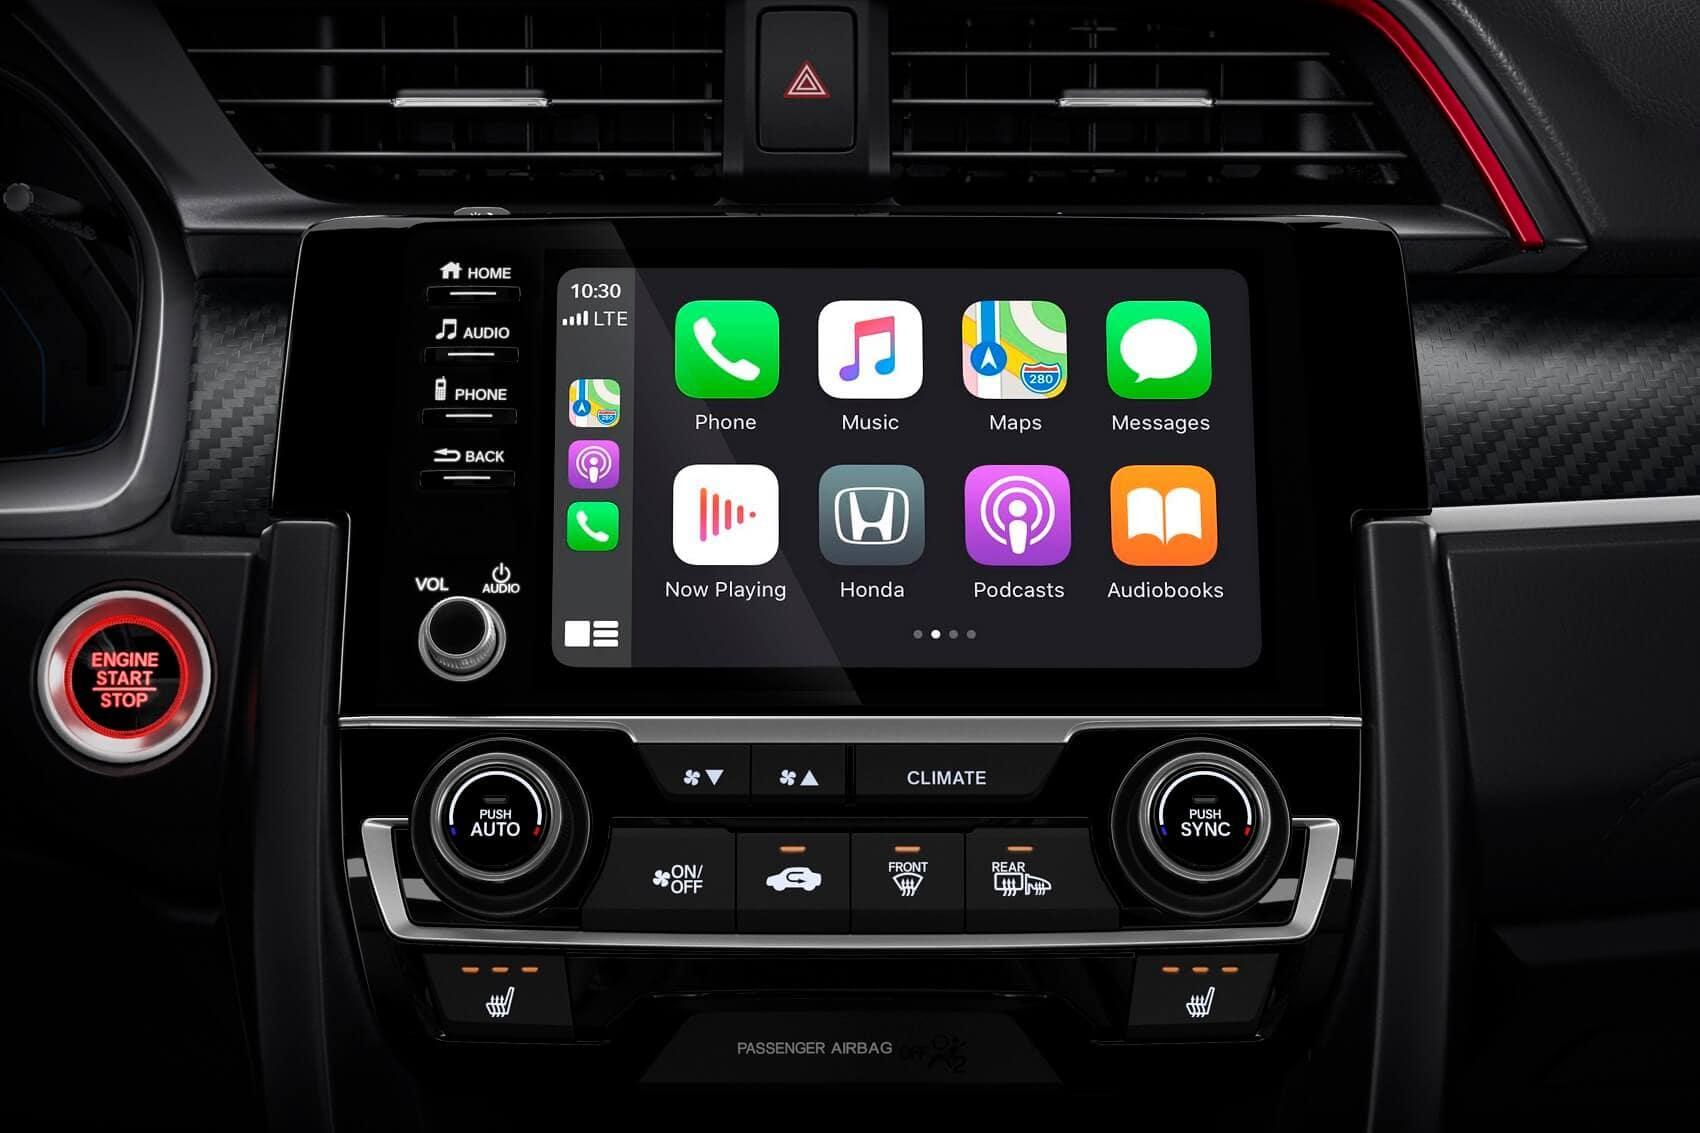 Honda Civic Interior Technology